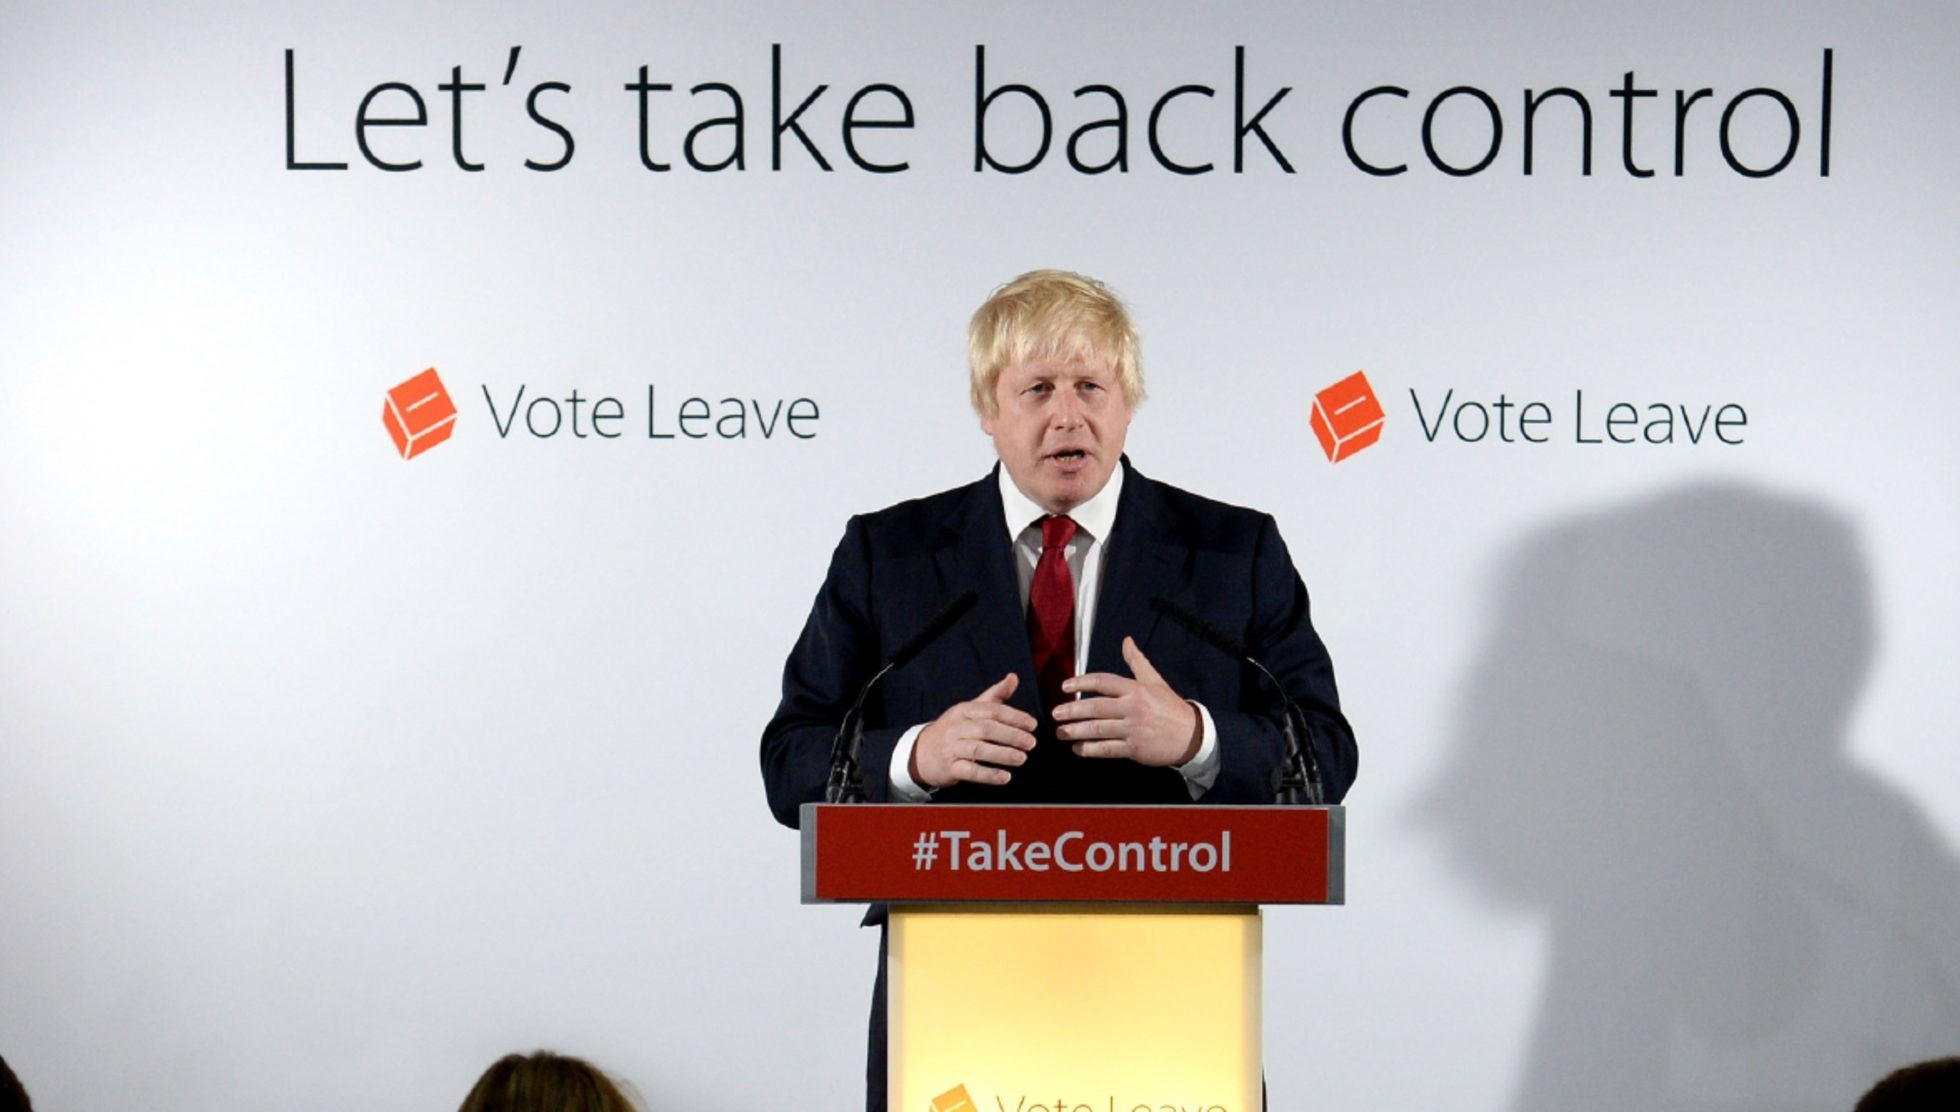 Boris Johnson will not be taking control of the UK.